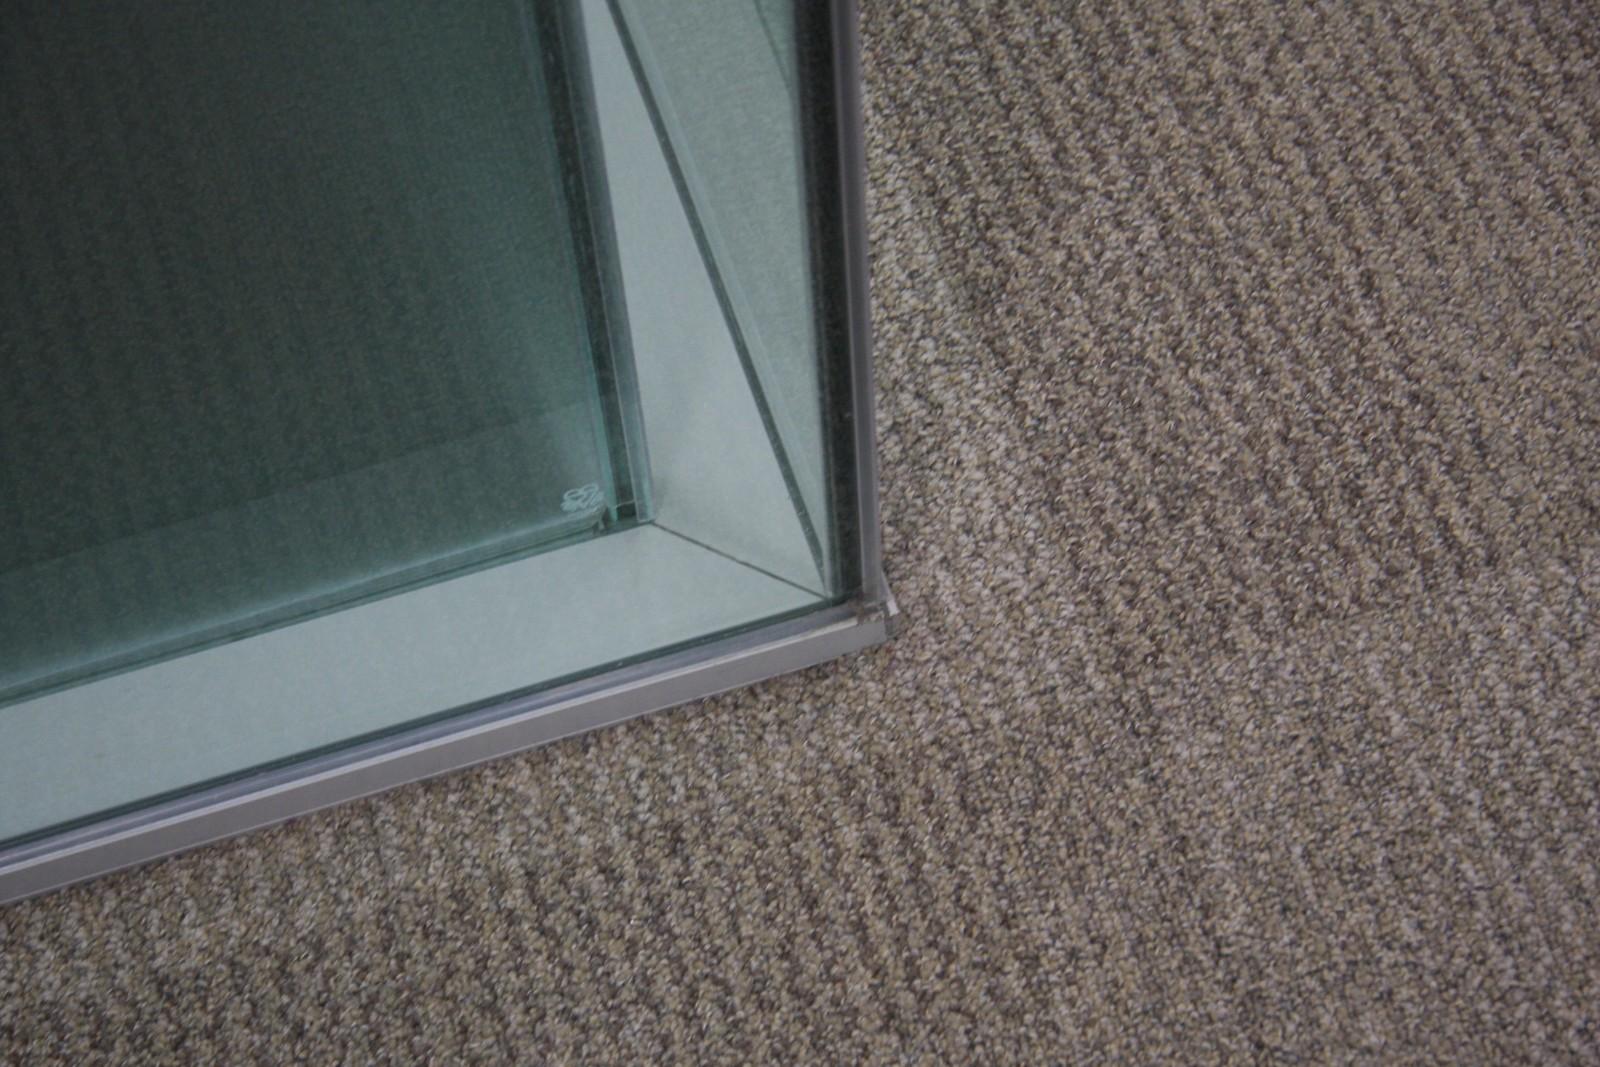 double glazed windows benefits in Melbourne, Victoria